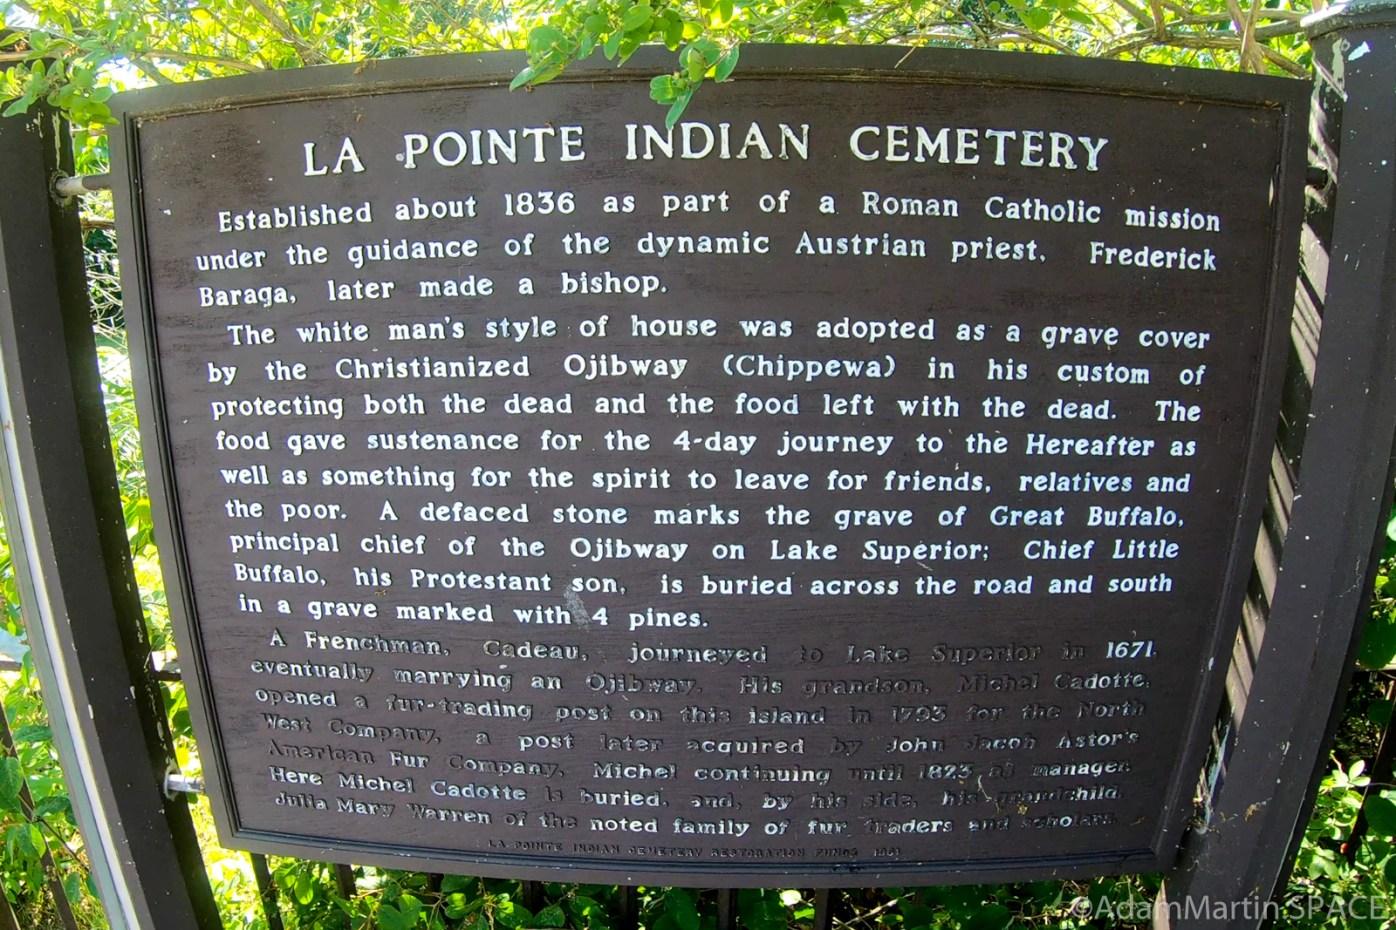 La Pointe Indian Cemetery sign